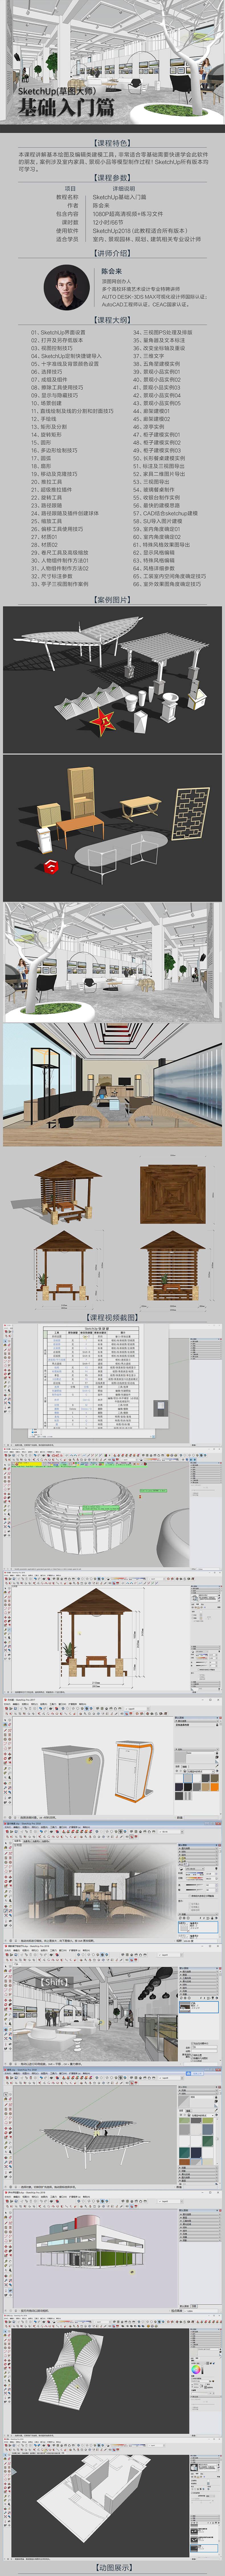 SketchUp2018草图大师3D设计零基础入门教程